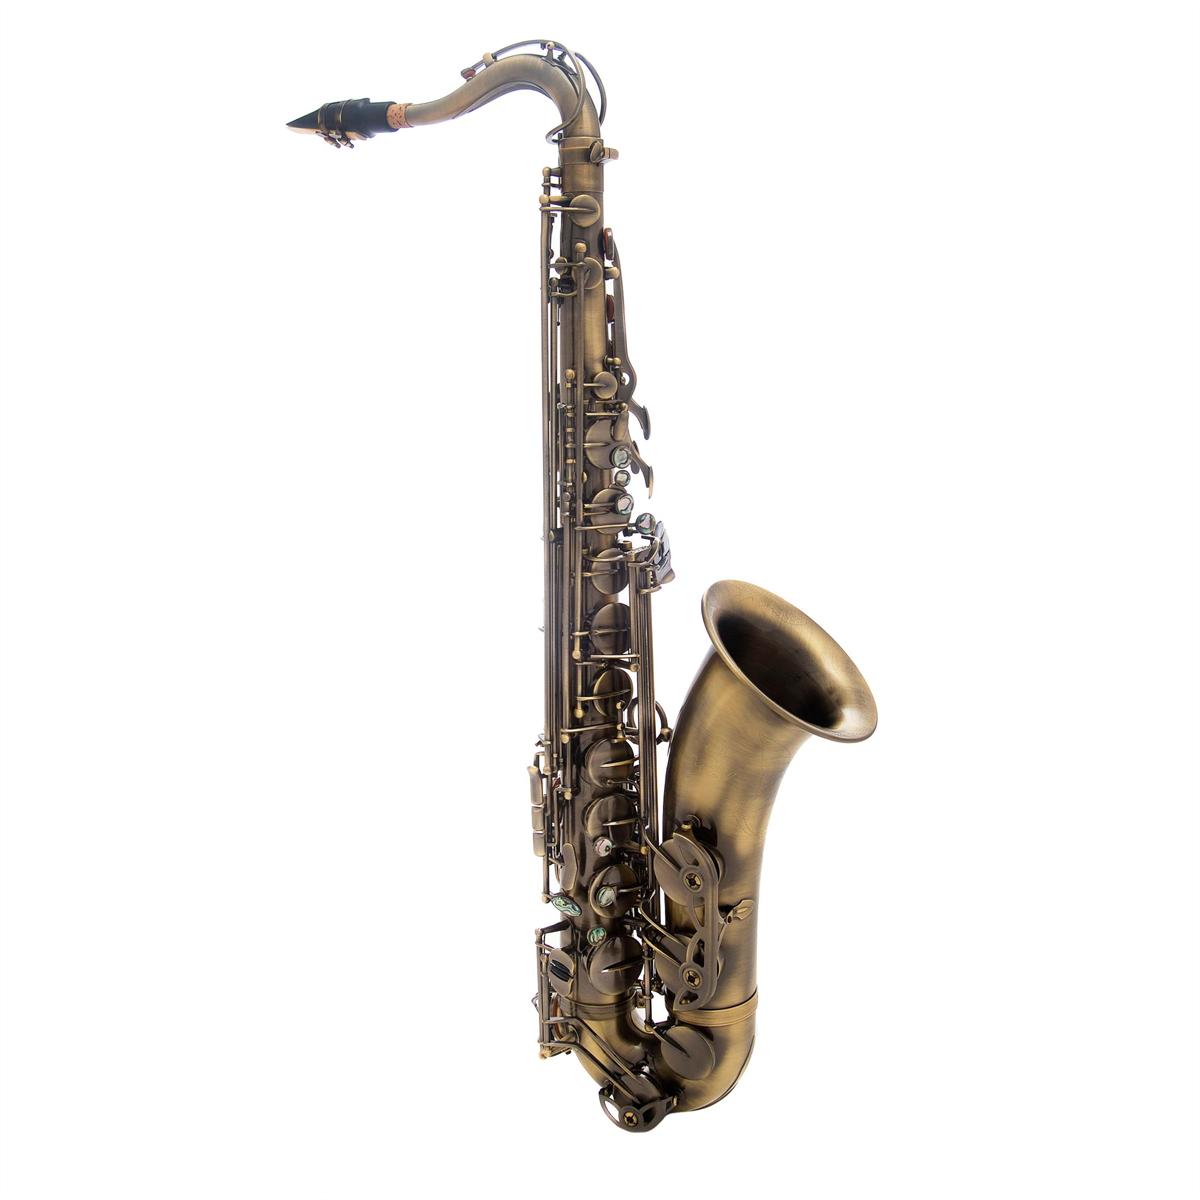 John Packer Tenor Saxofoon JP042V - Uitvoering: Vintage